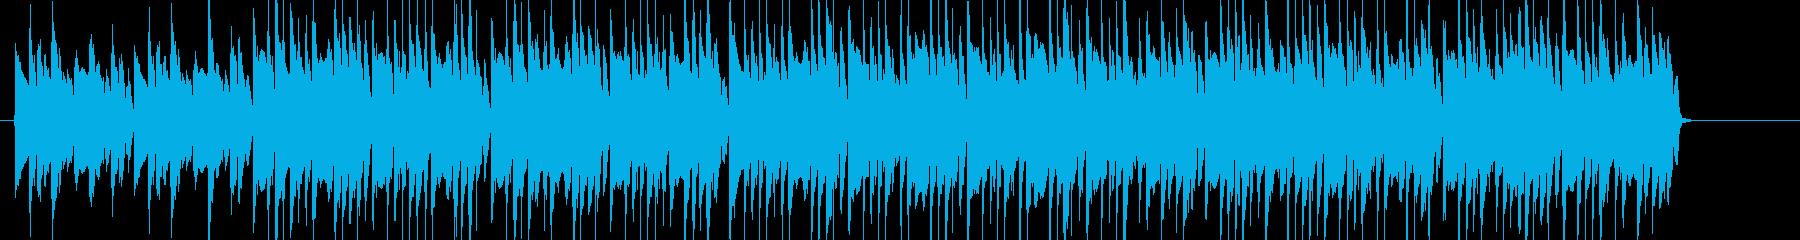 CMに合いそうな軽快な音楽(ボサノバ)の再生済みの波形